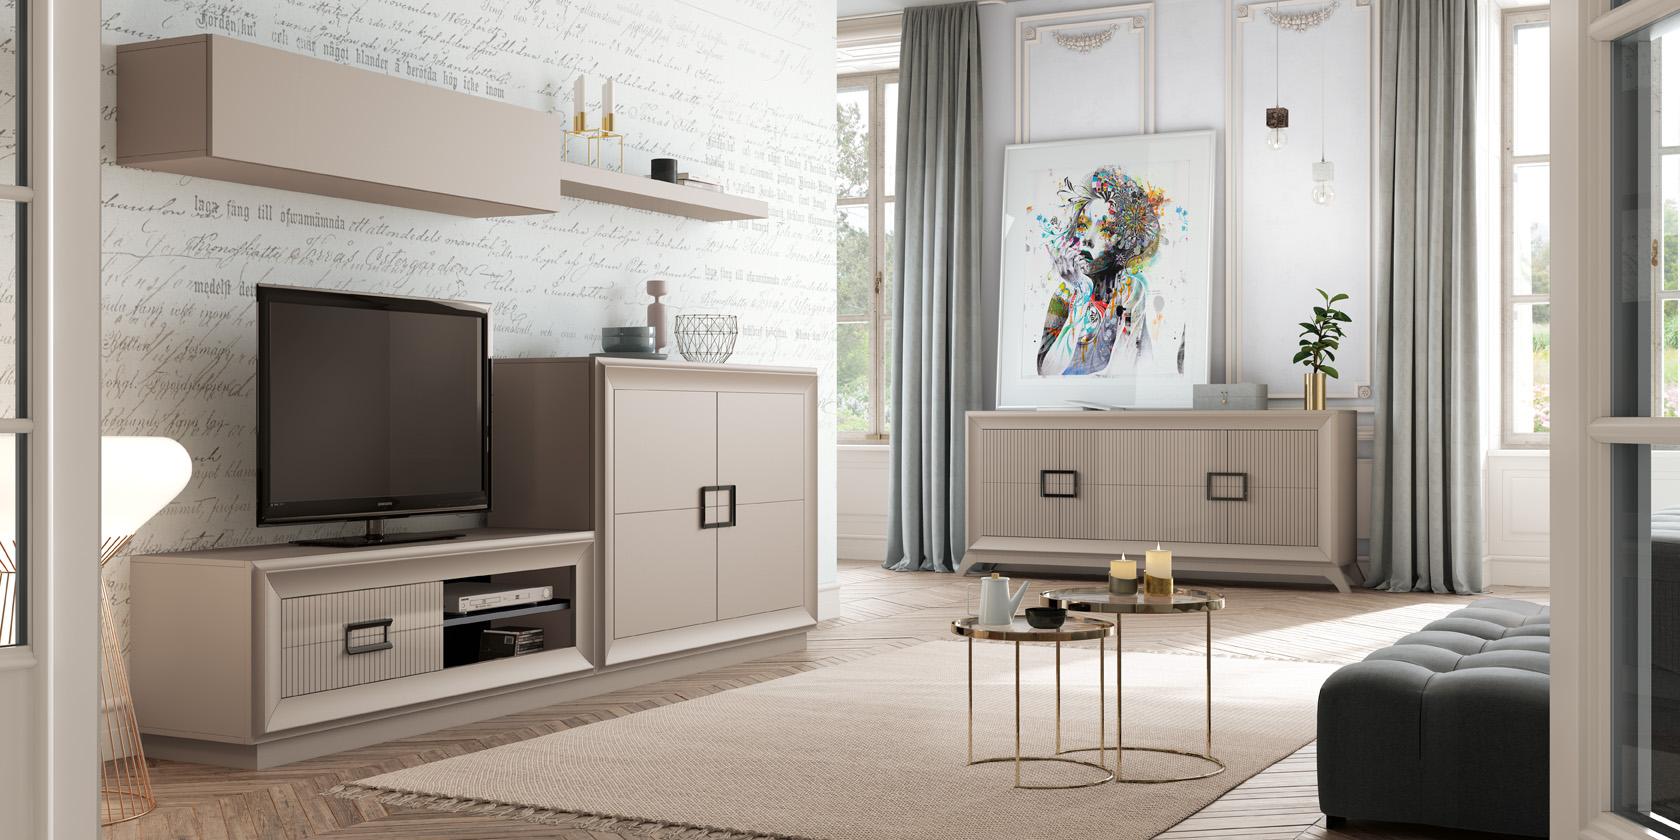 salon-contemporaneo-L-GANT-muebles-paco-caballero-724-5cc6bd7ce2450